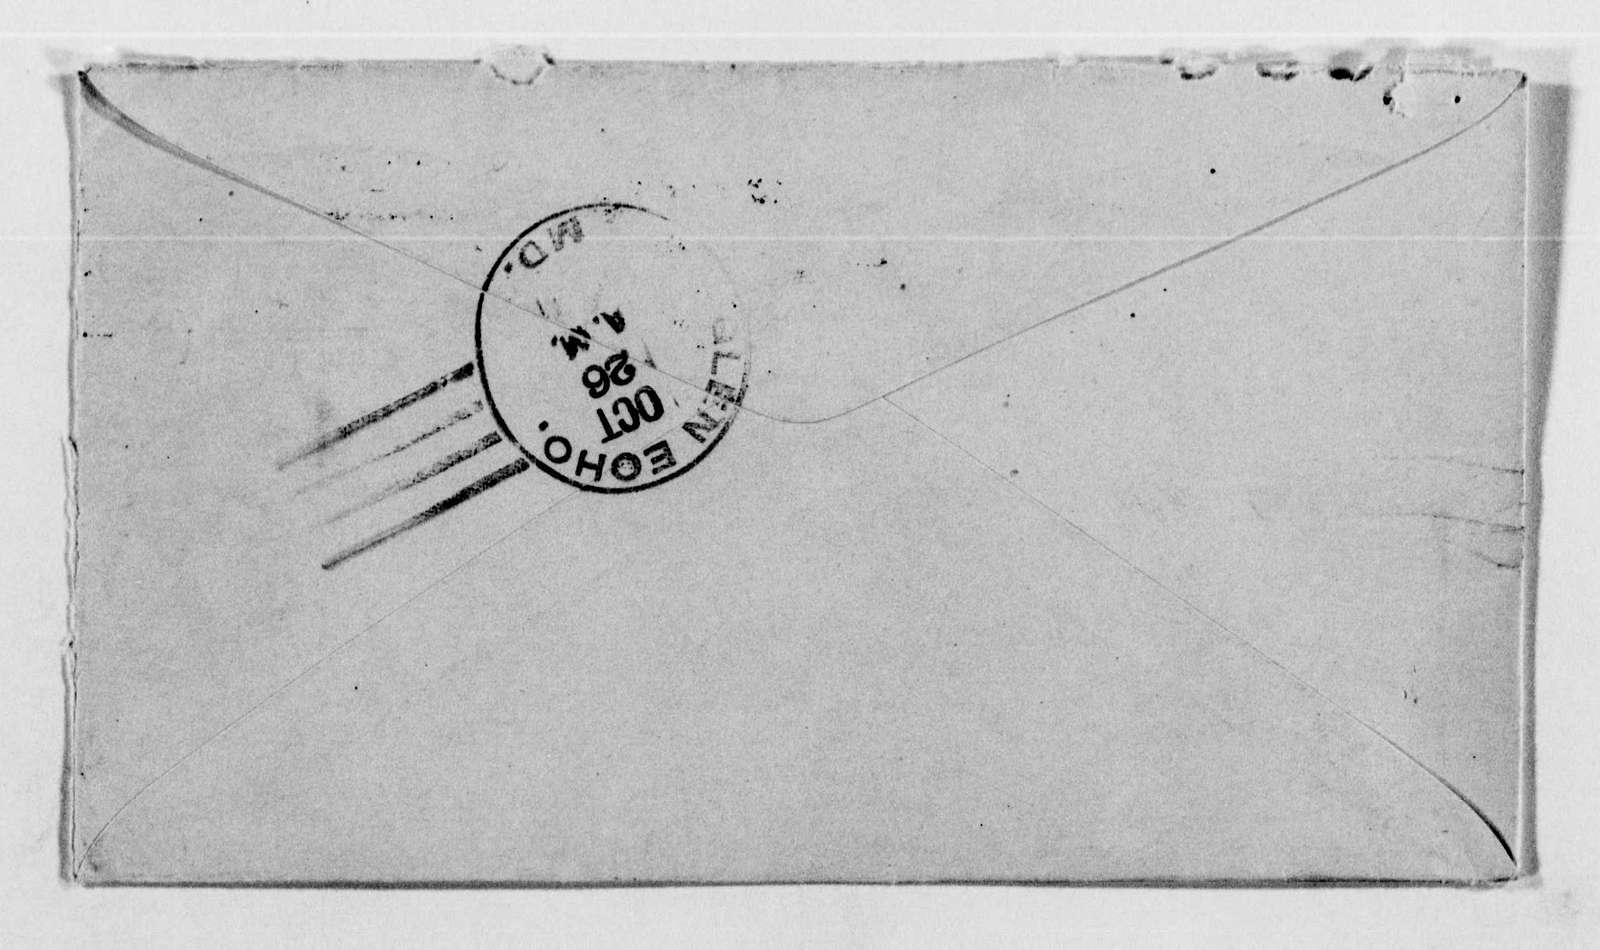 Clara Barton Papers: Family Papers: Barton, William E. (cousin); Correspondence, 1901-1929, undated